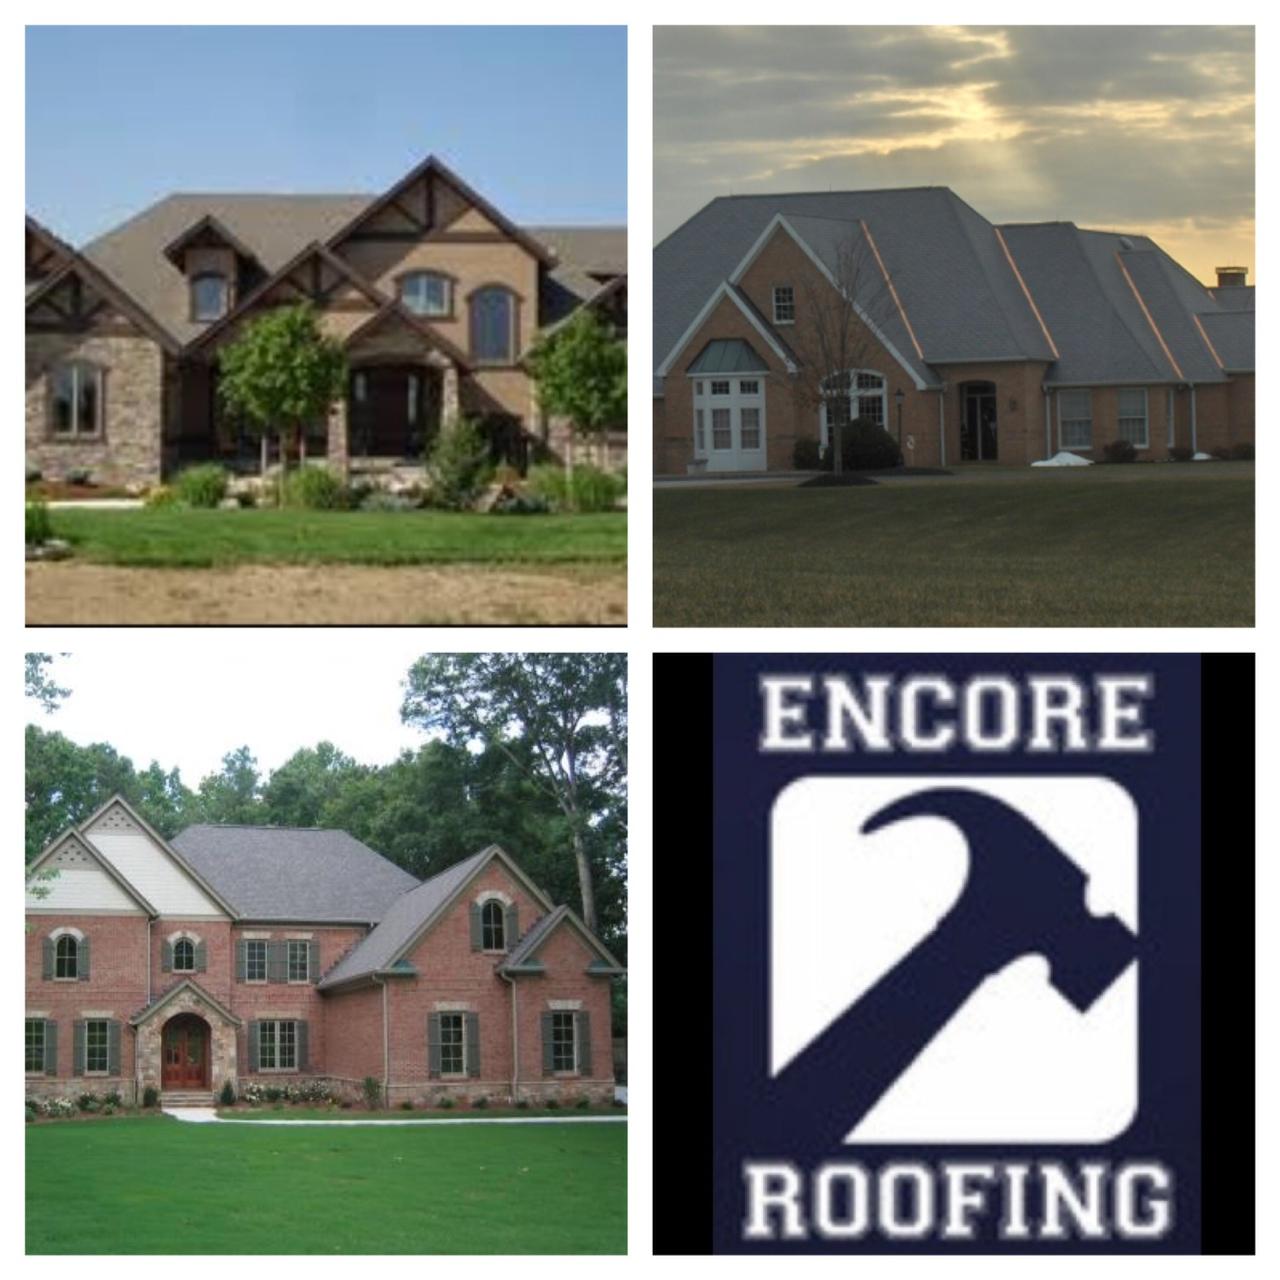 ENCORE ROOFING, LLC image 9